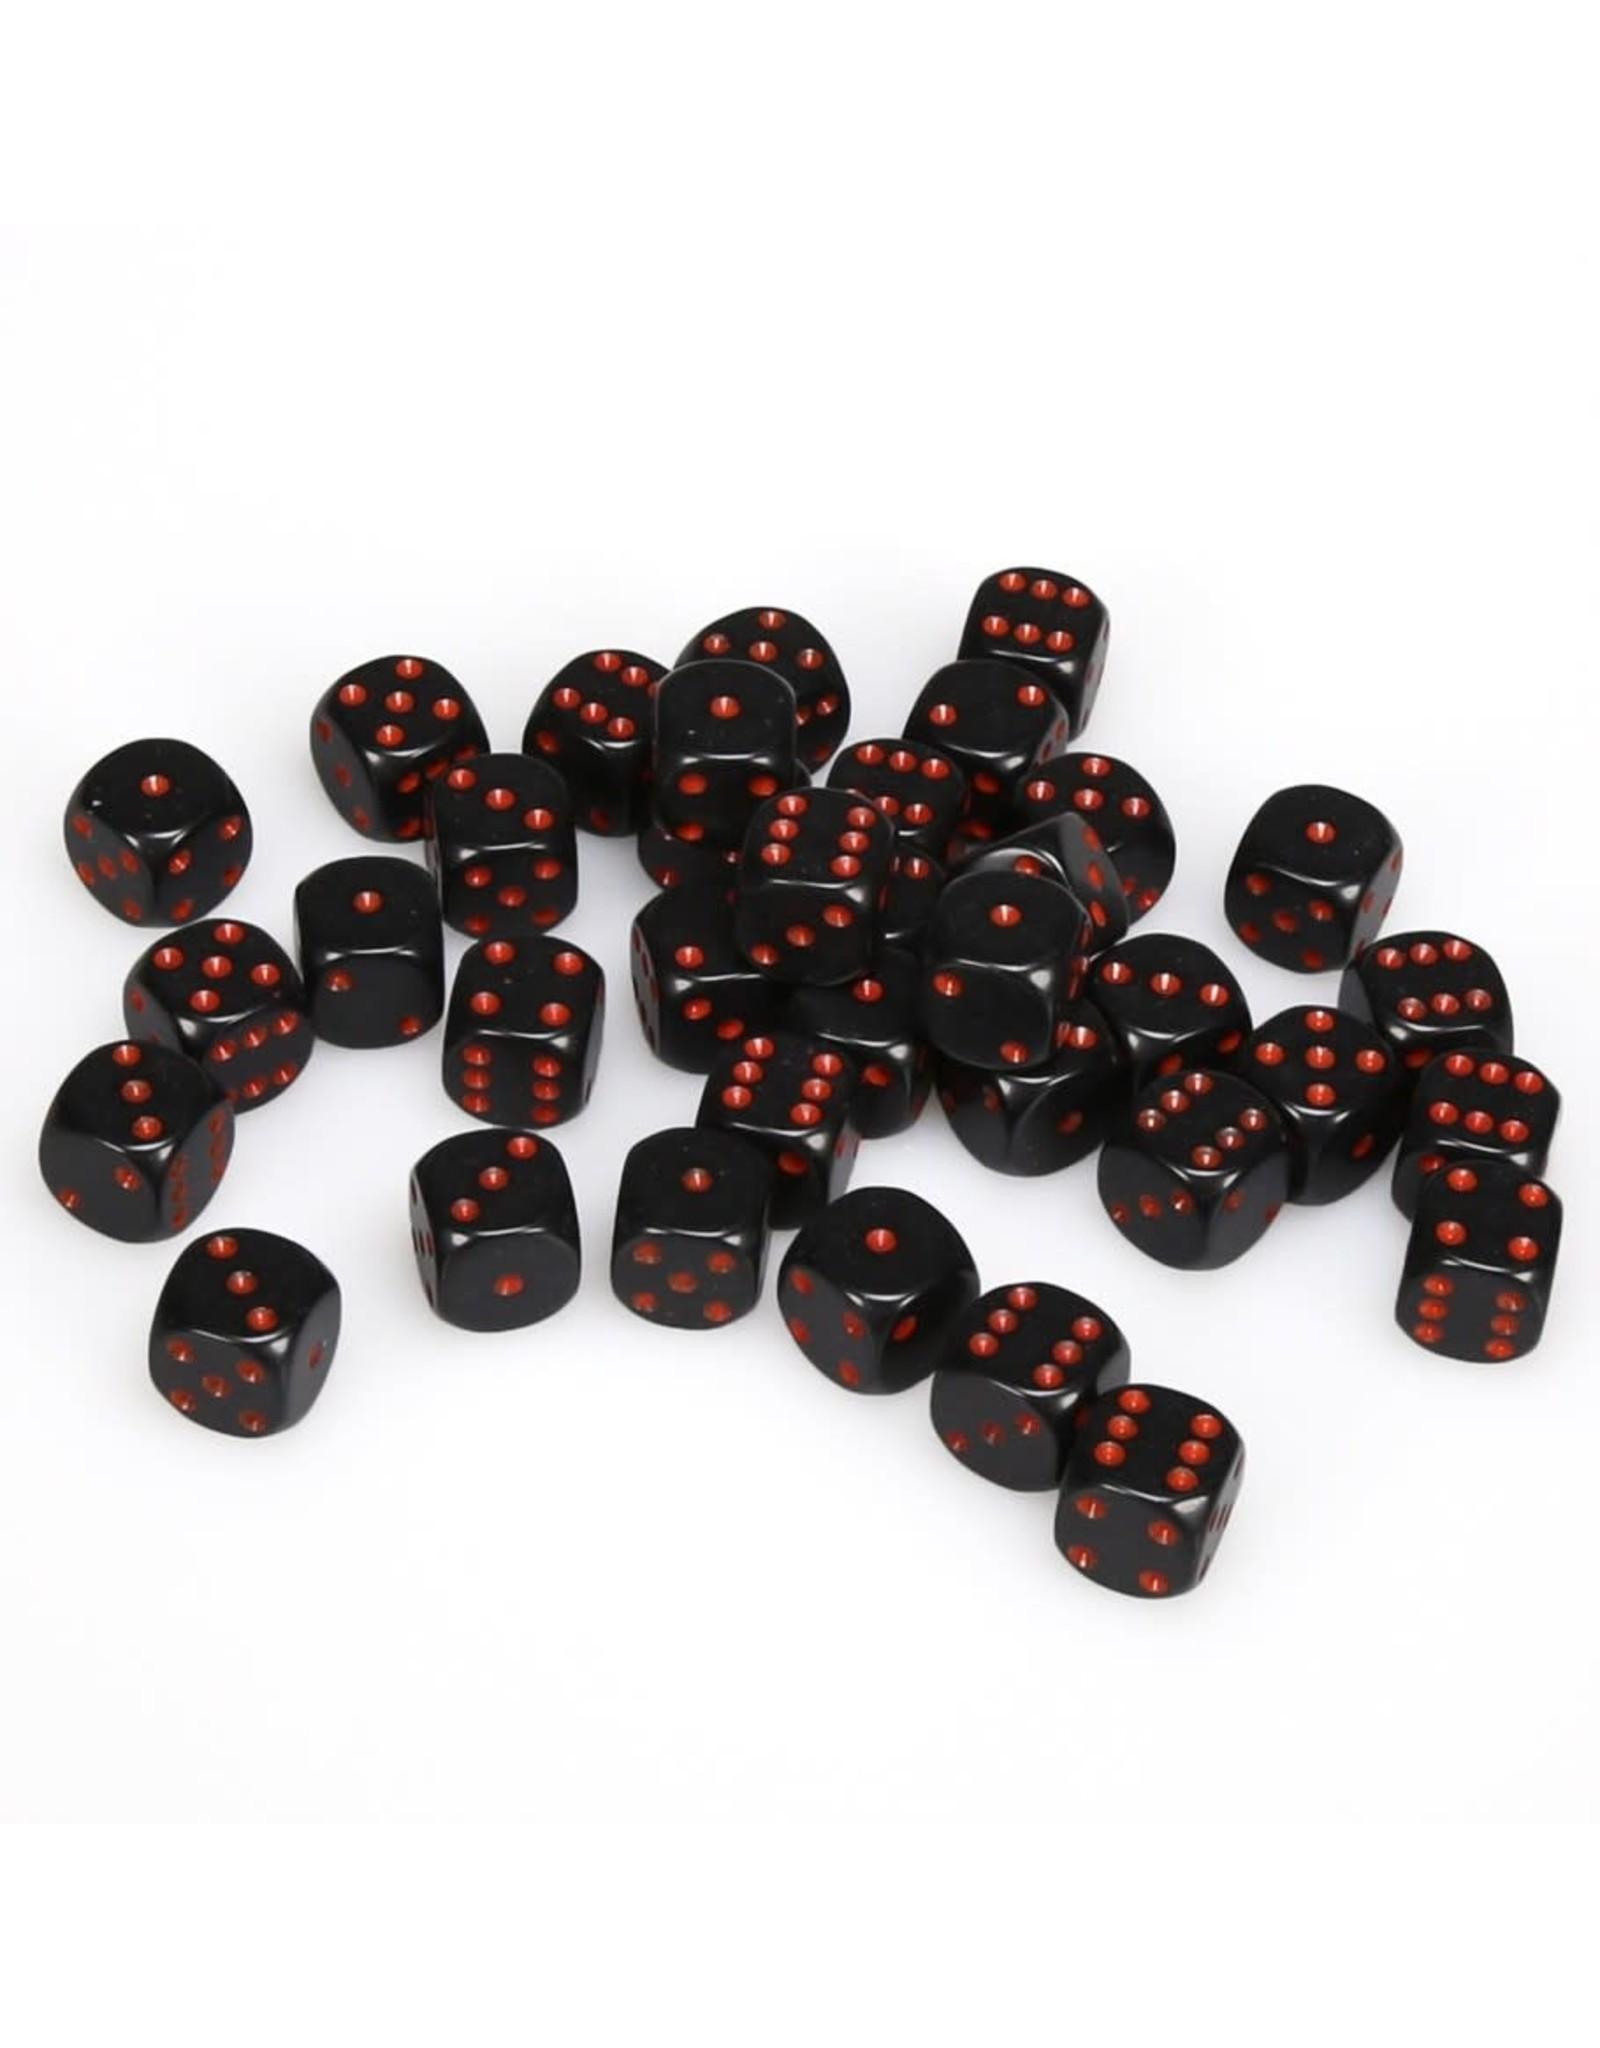 Chessex d6 12mm 36 Dice Set Opaque Black w/Red CHX25818